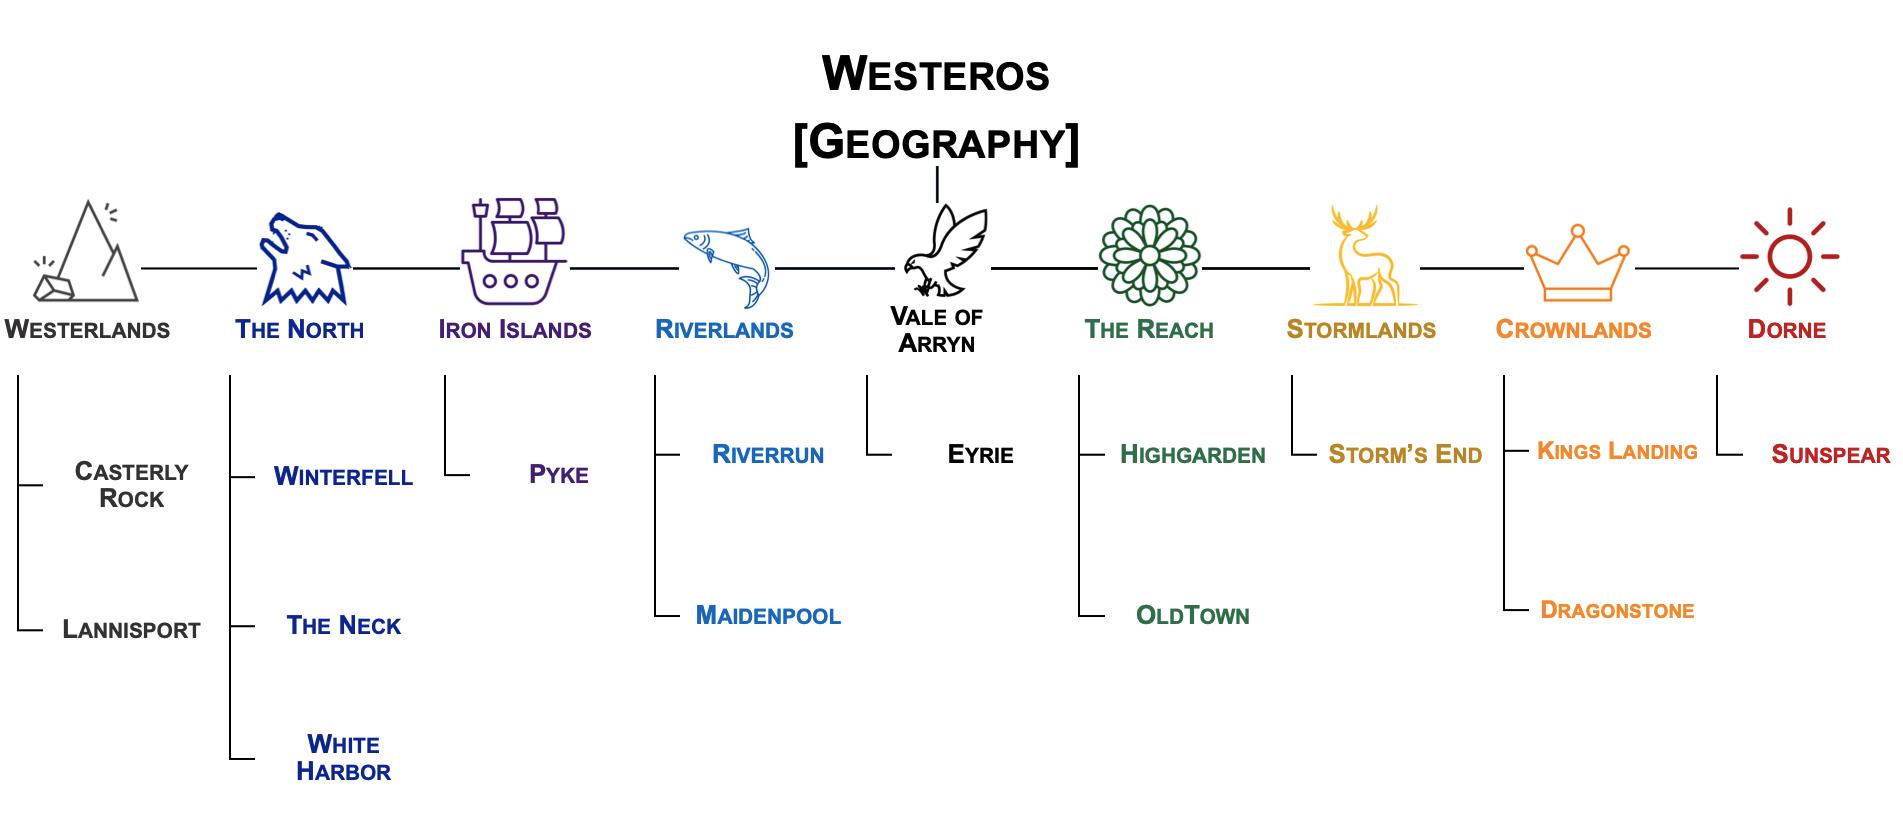 Visual representation of the GOT 7th Season Westeros (Geography) Taxonomy